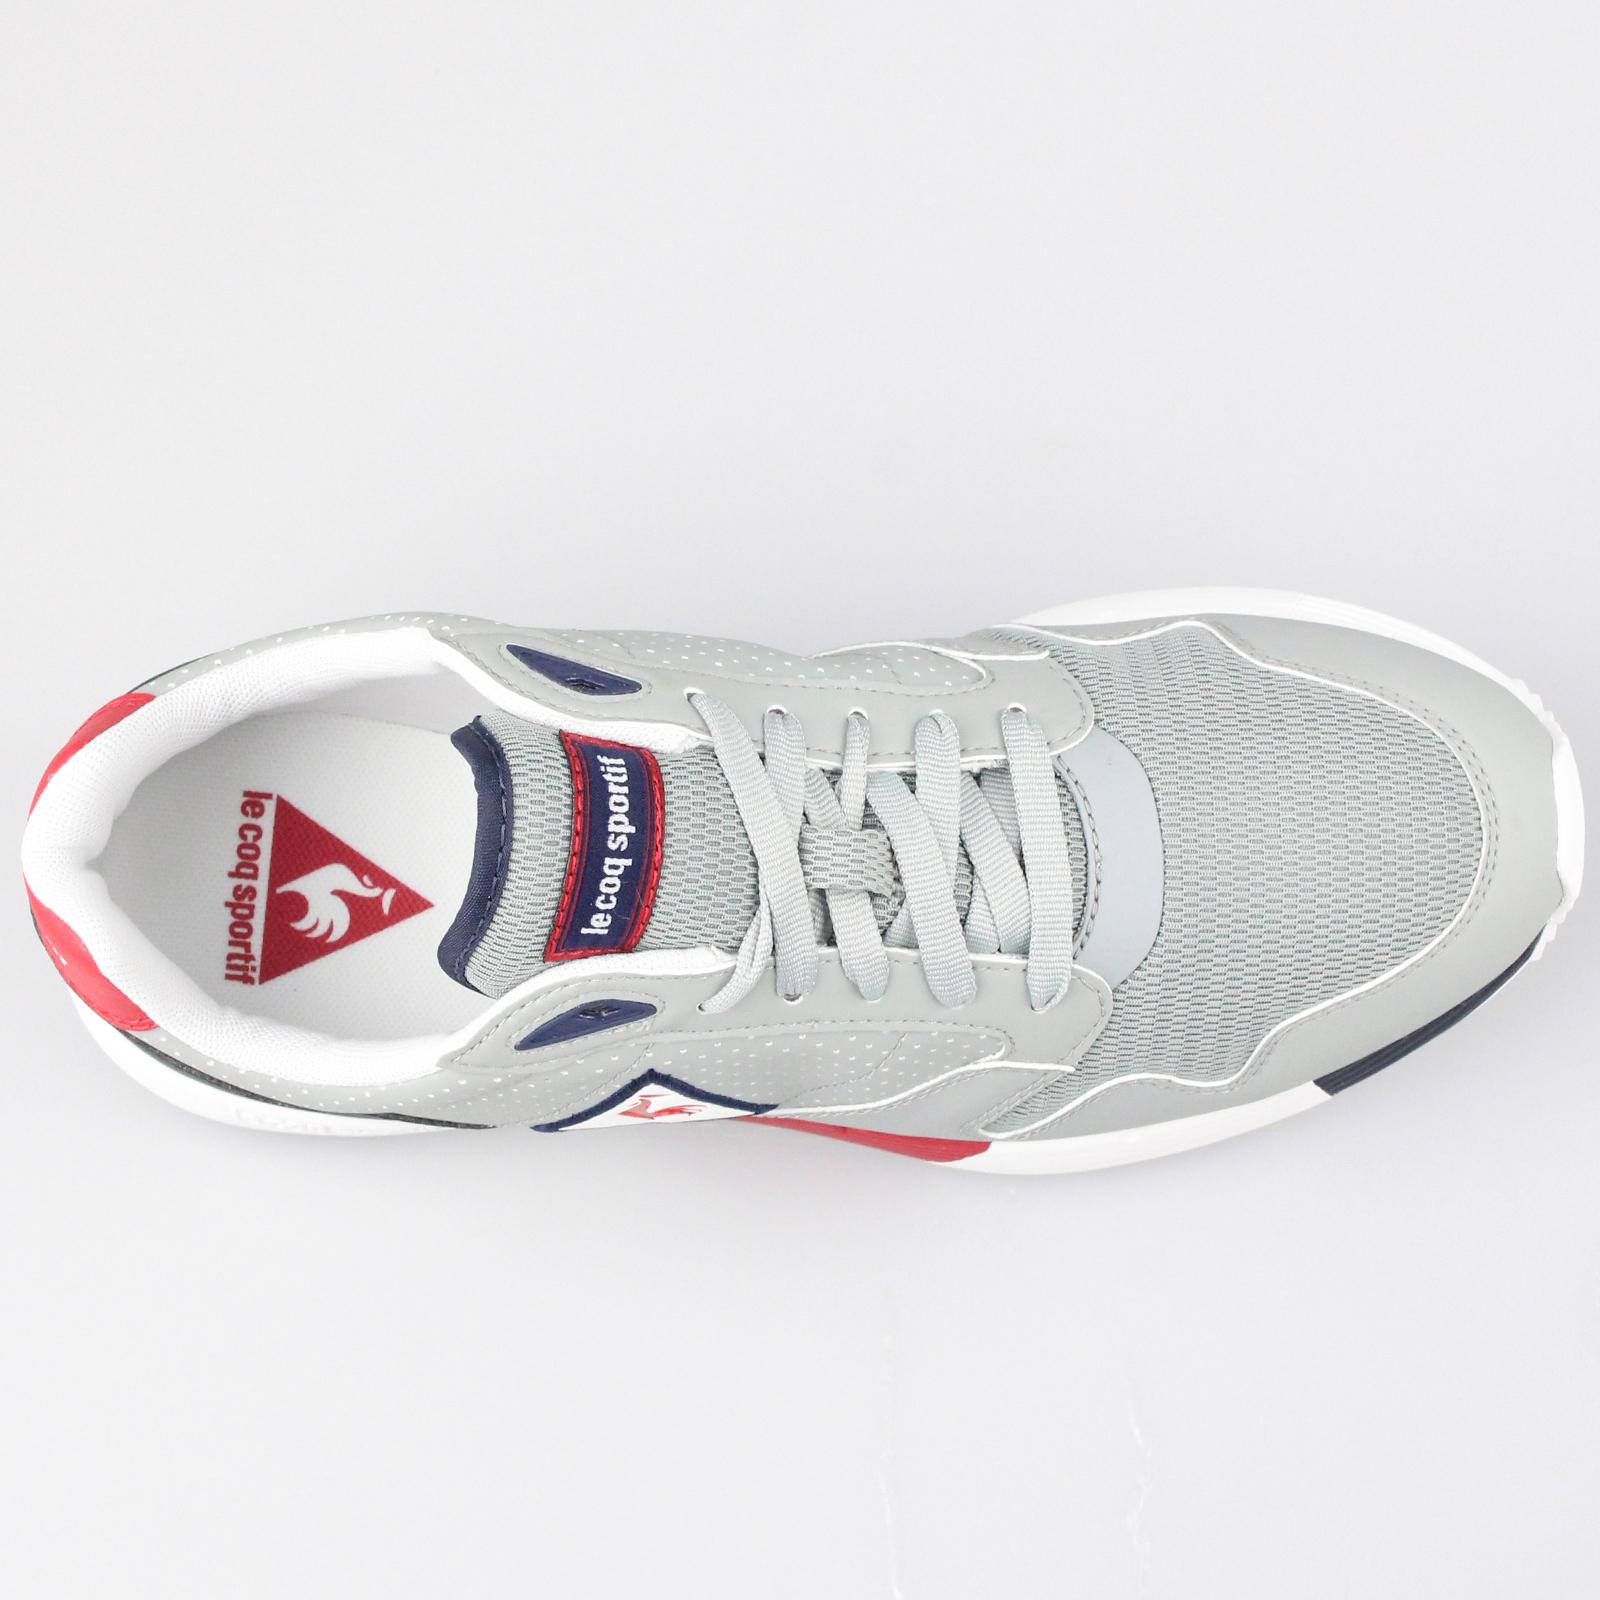 c112aa2aa081d4 Previous; Next. 1; 2. Previous; Next. Pantofi sport barbati Le Coq Sportif  Omega X Sport 1810159